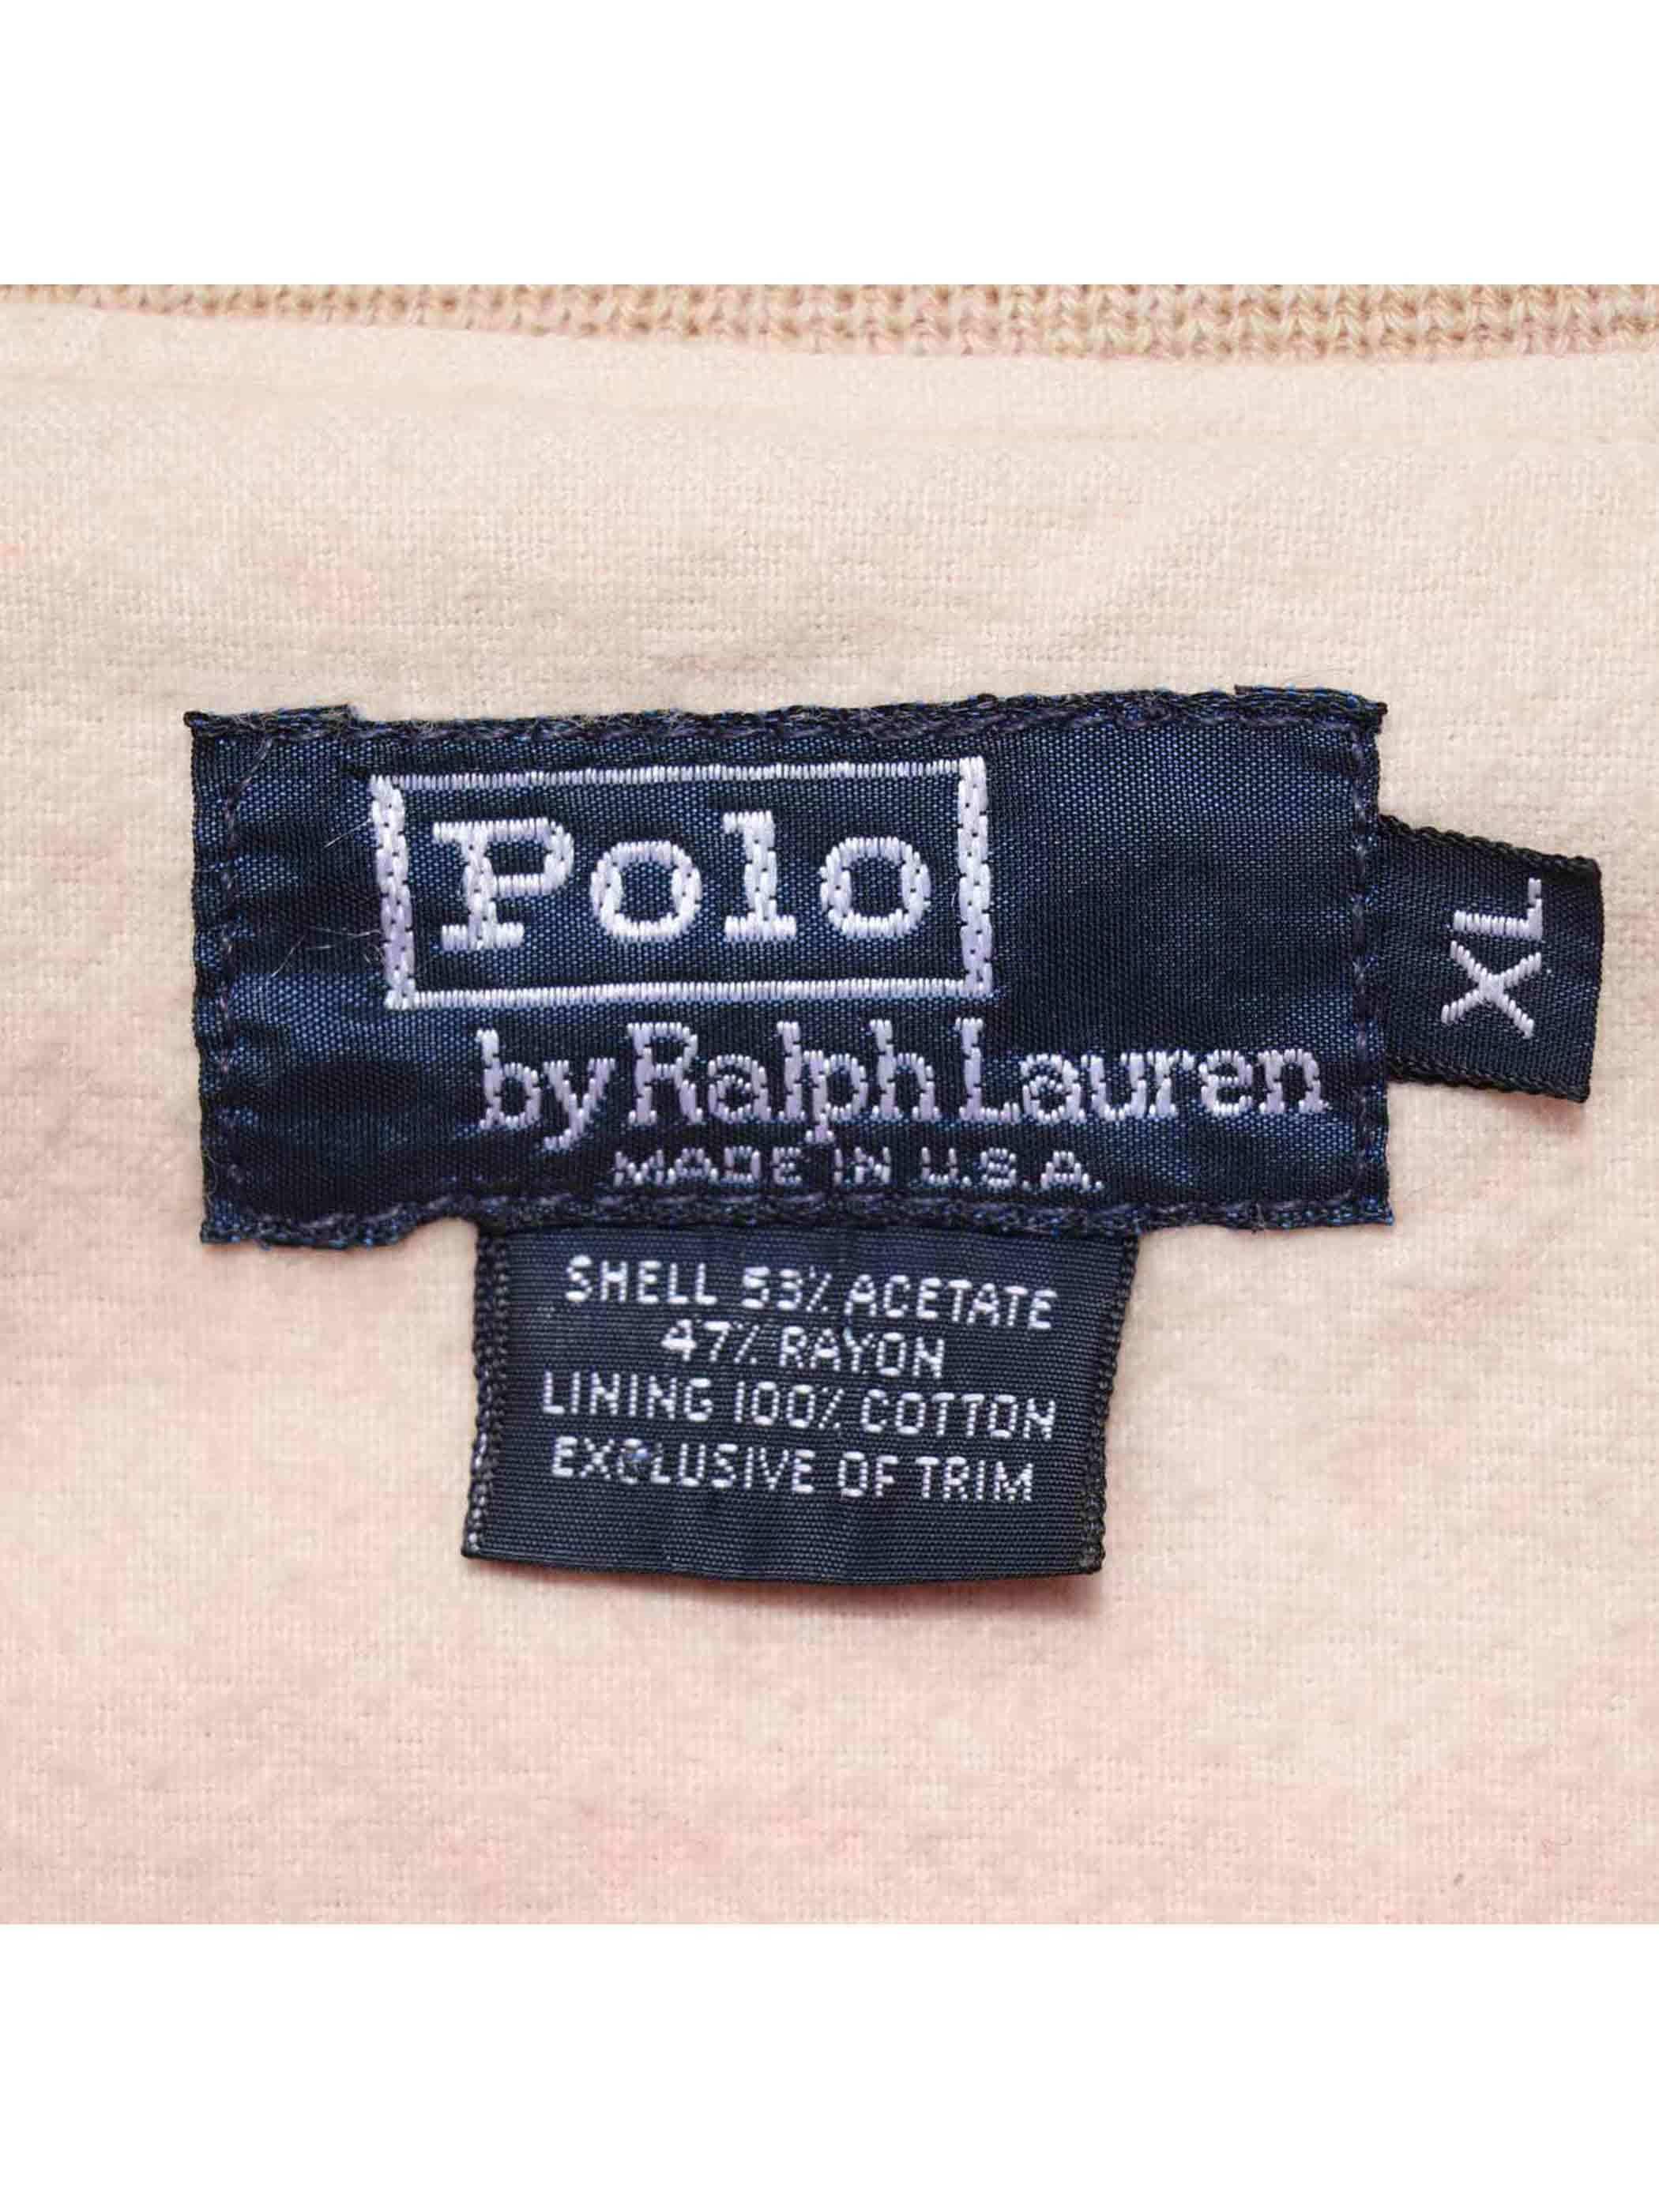 "90's POLO RALPH LAUREN ""POLO BALL"" サテンスタジャン [XL]"